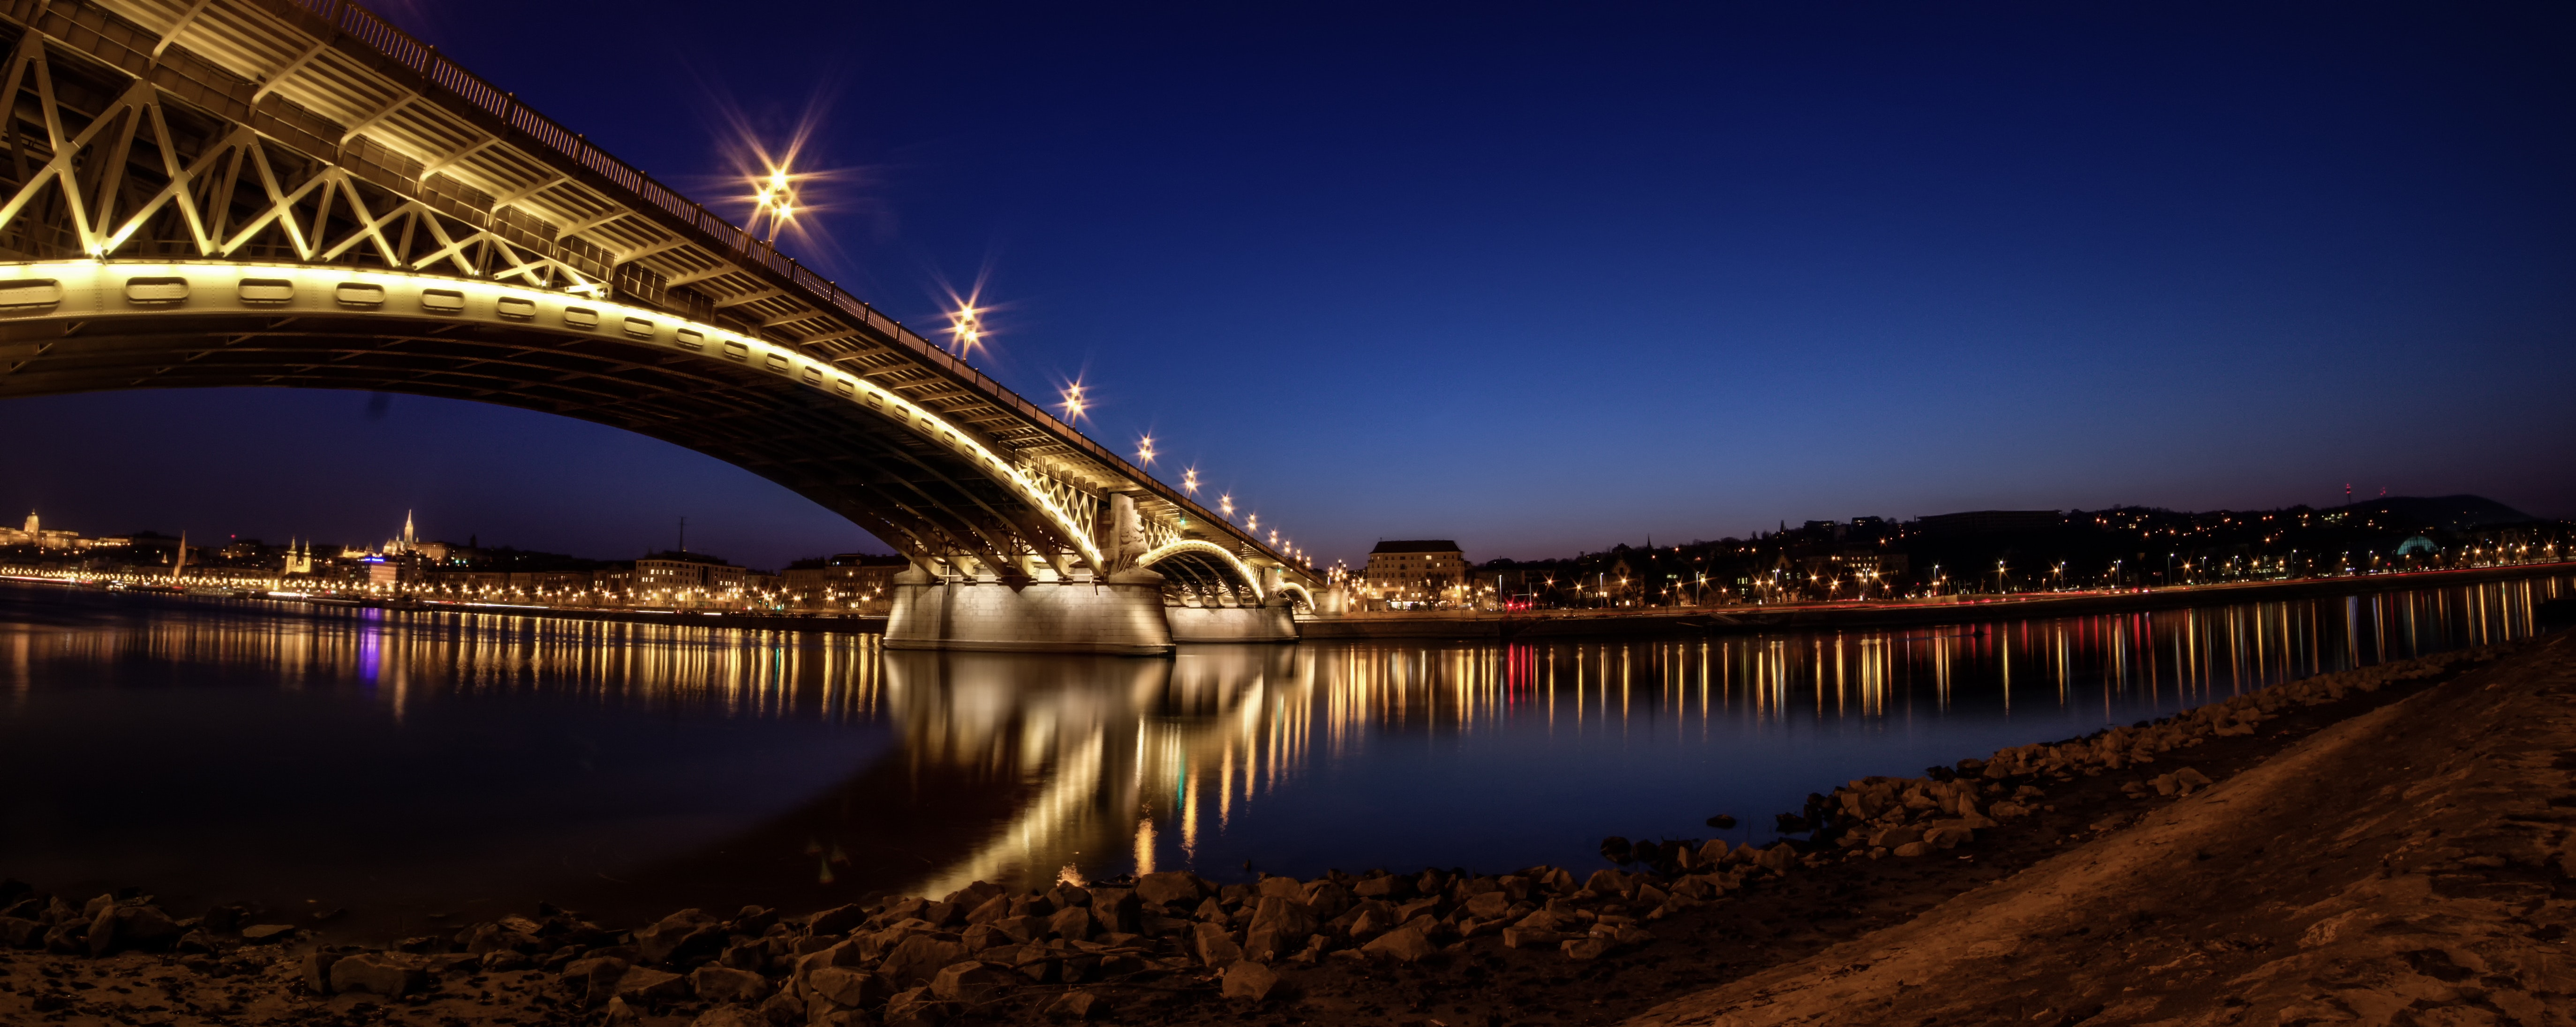 Black Cityscape during Night, Australia, Bridge, Buildings, City, HQ Photo